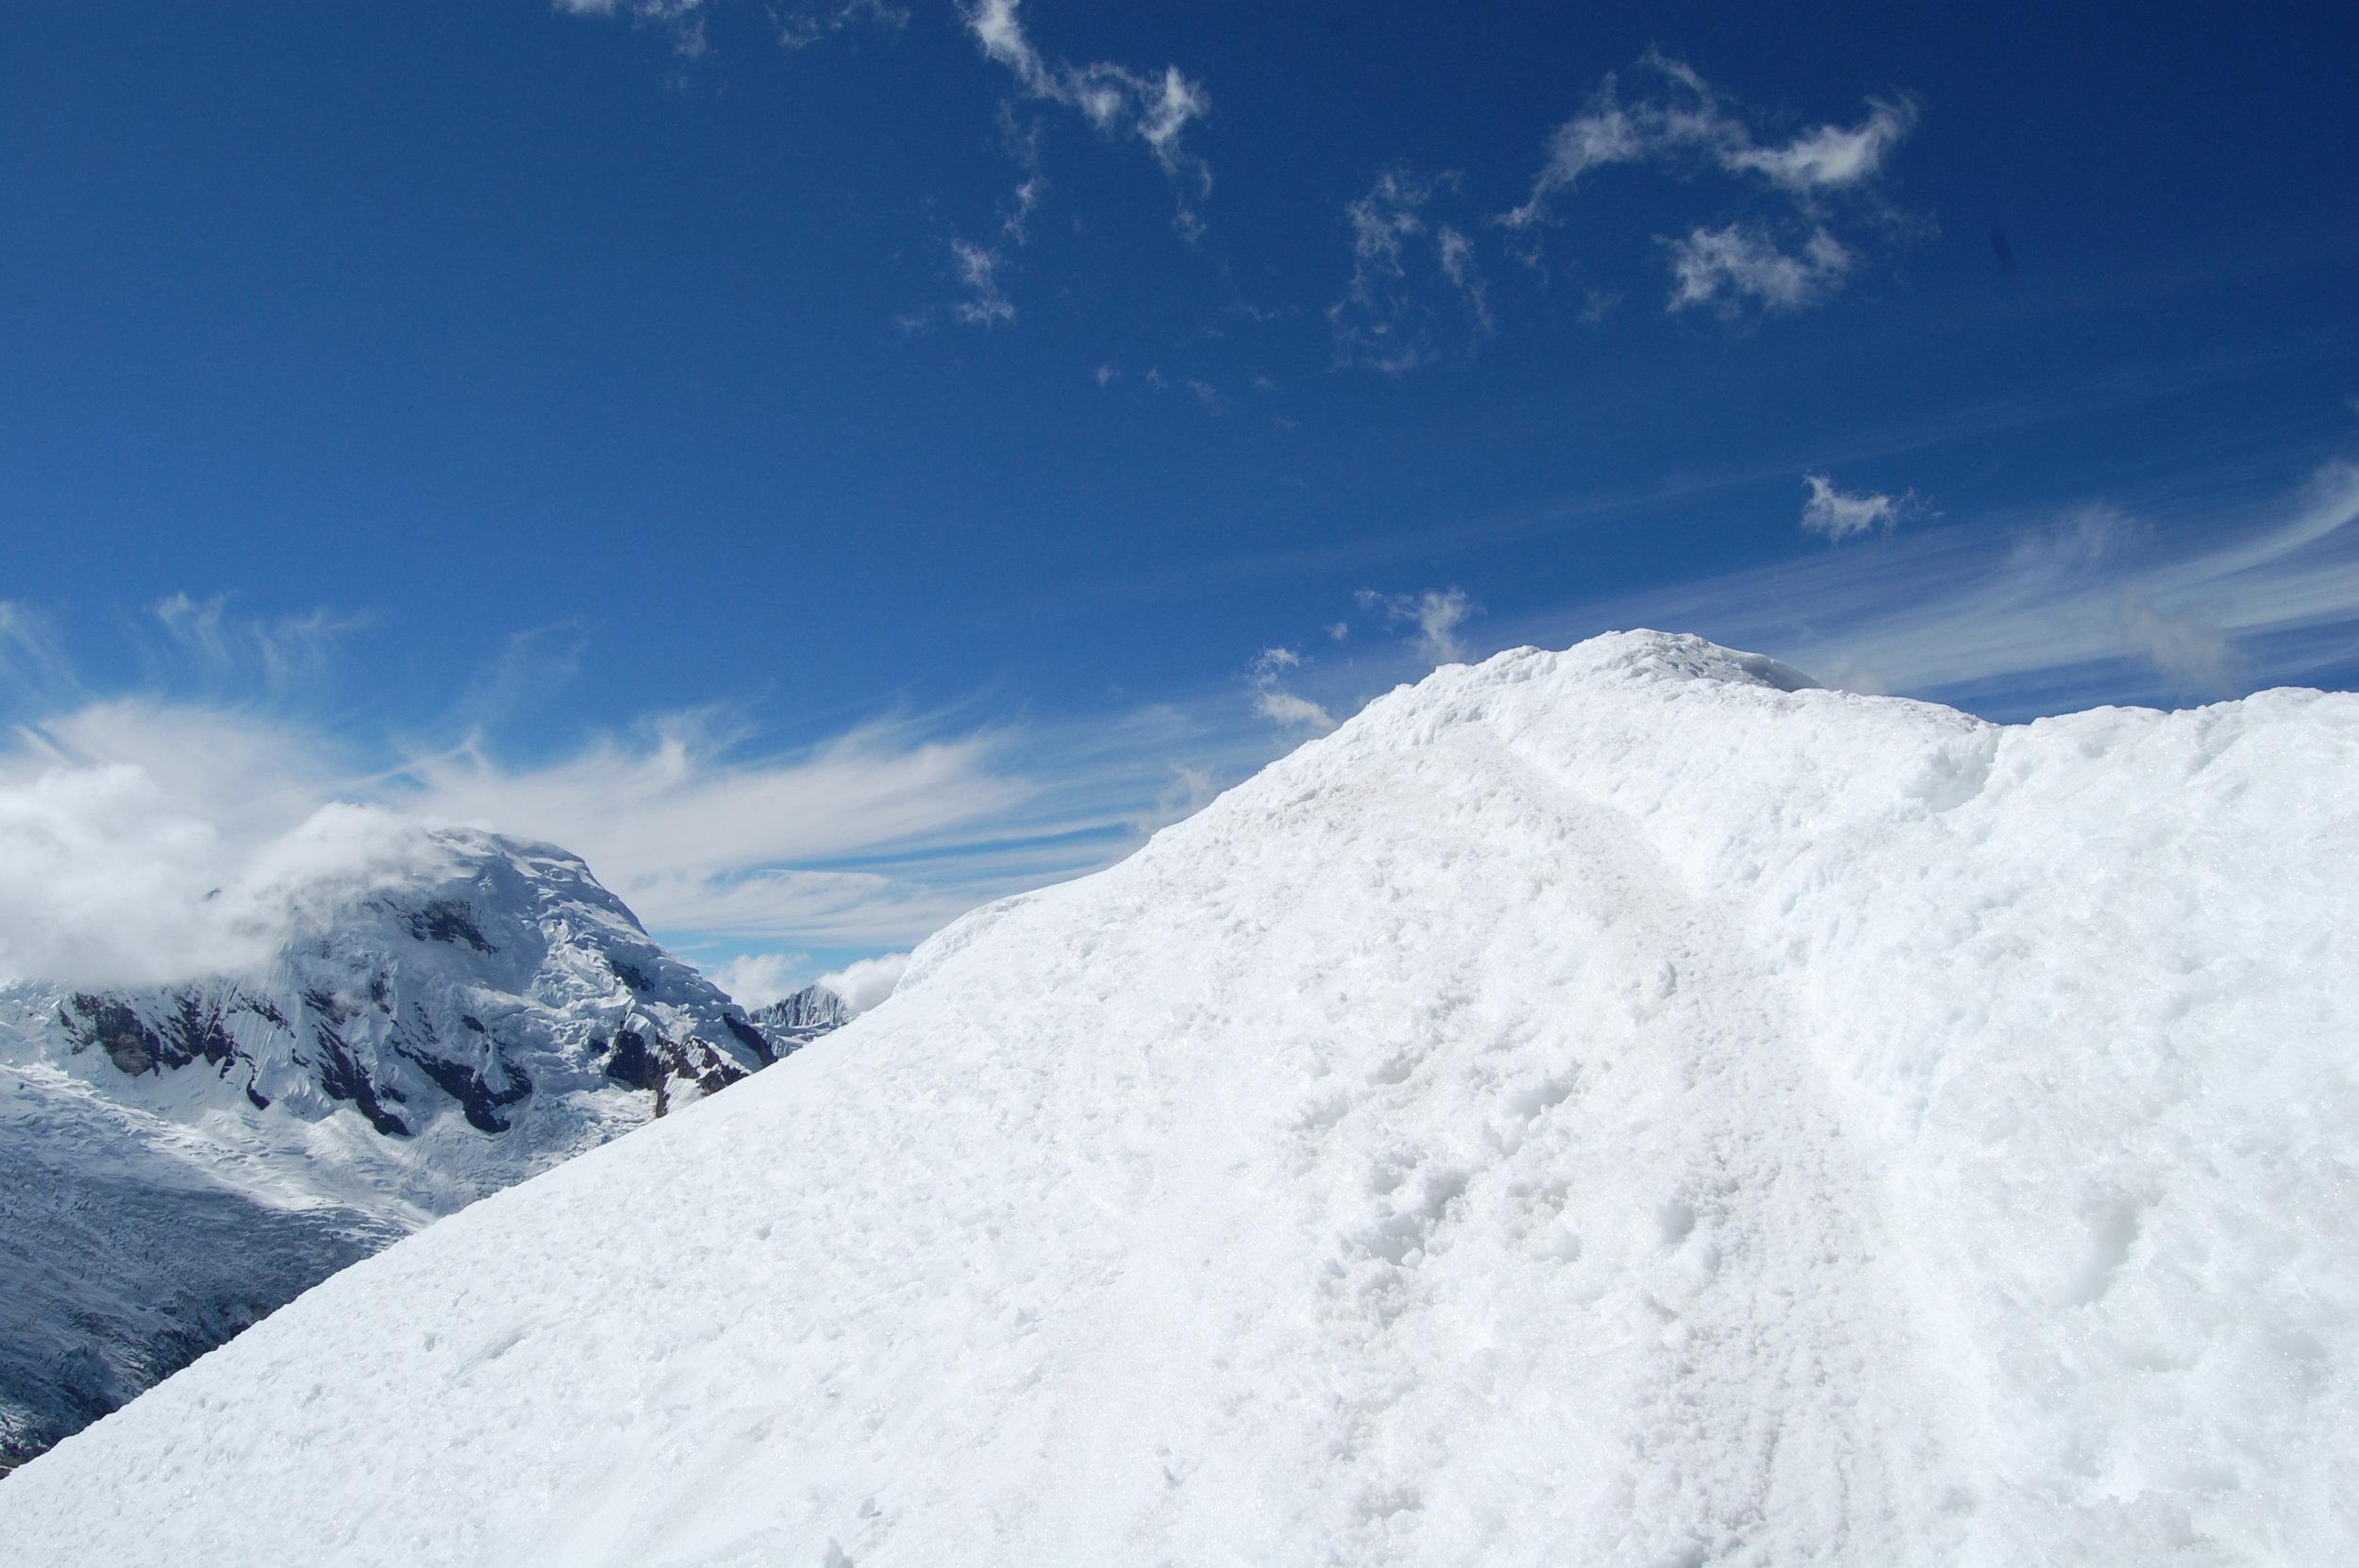 Tiny, steep summit on Ishinca, Cordillera Blanca, Peru